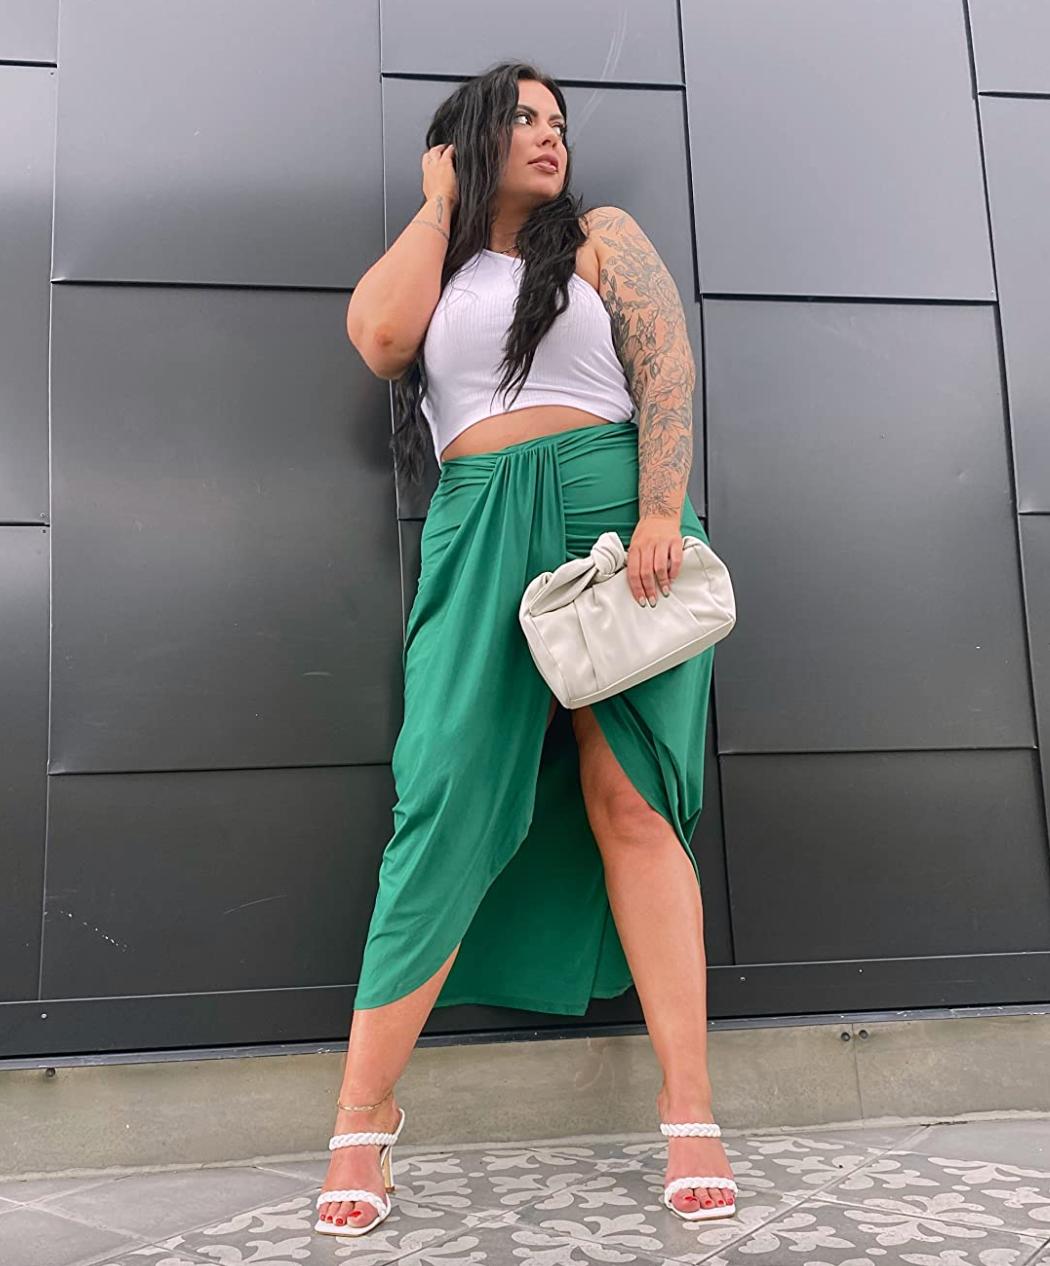 reviewer wearing the green skirt